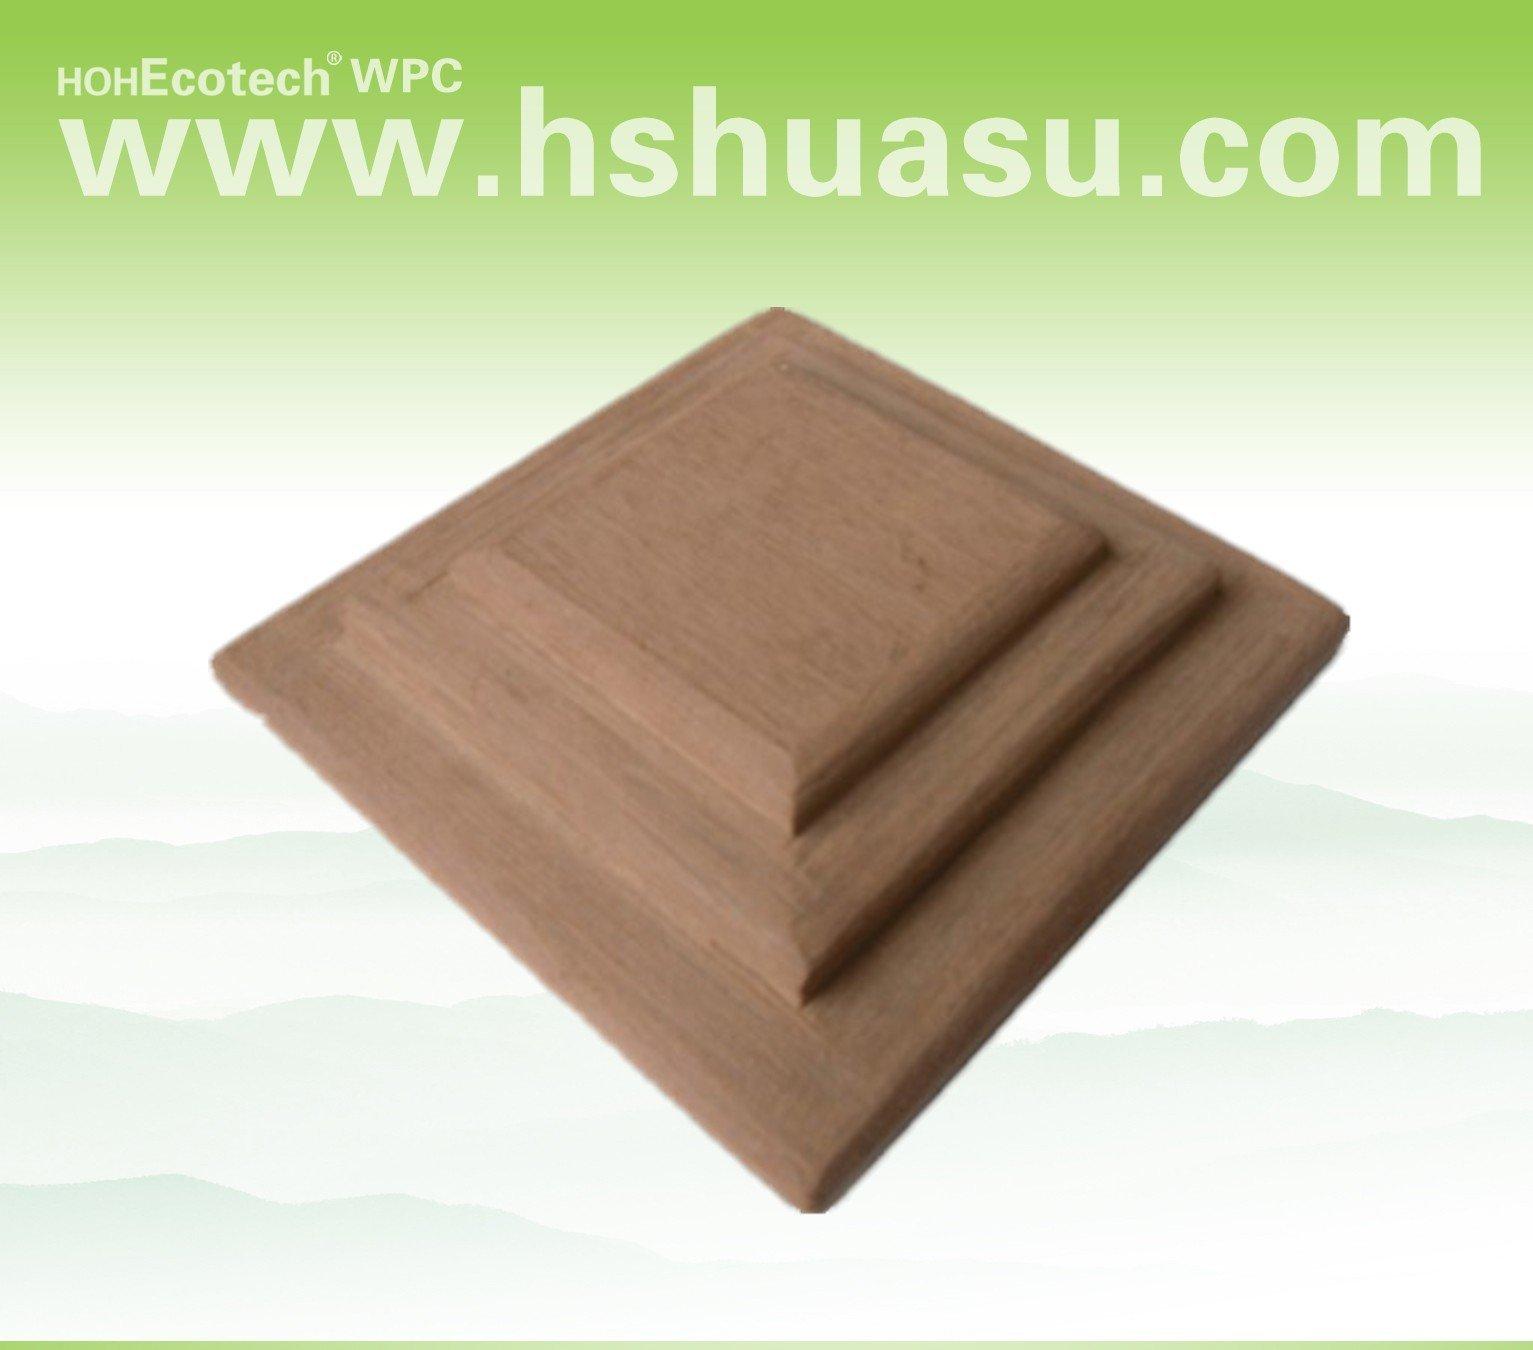 HM-120-2 120X120mm_